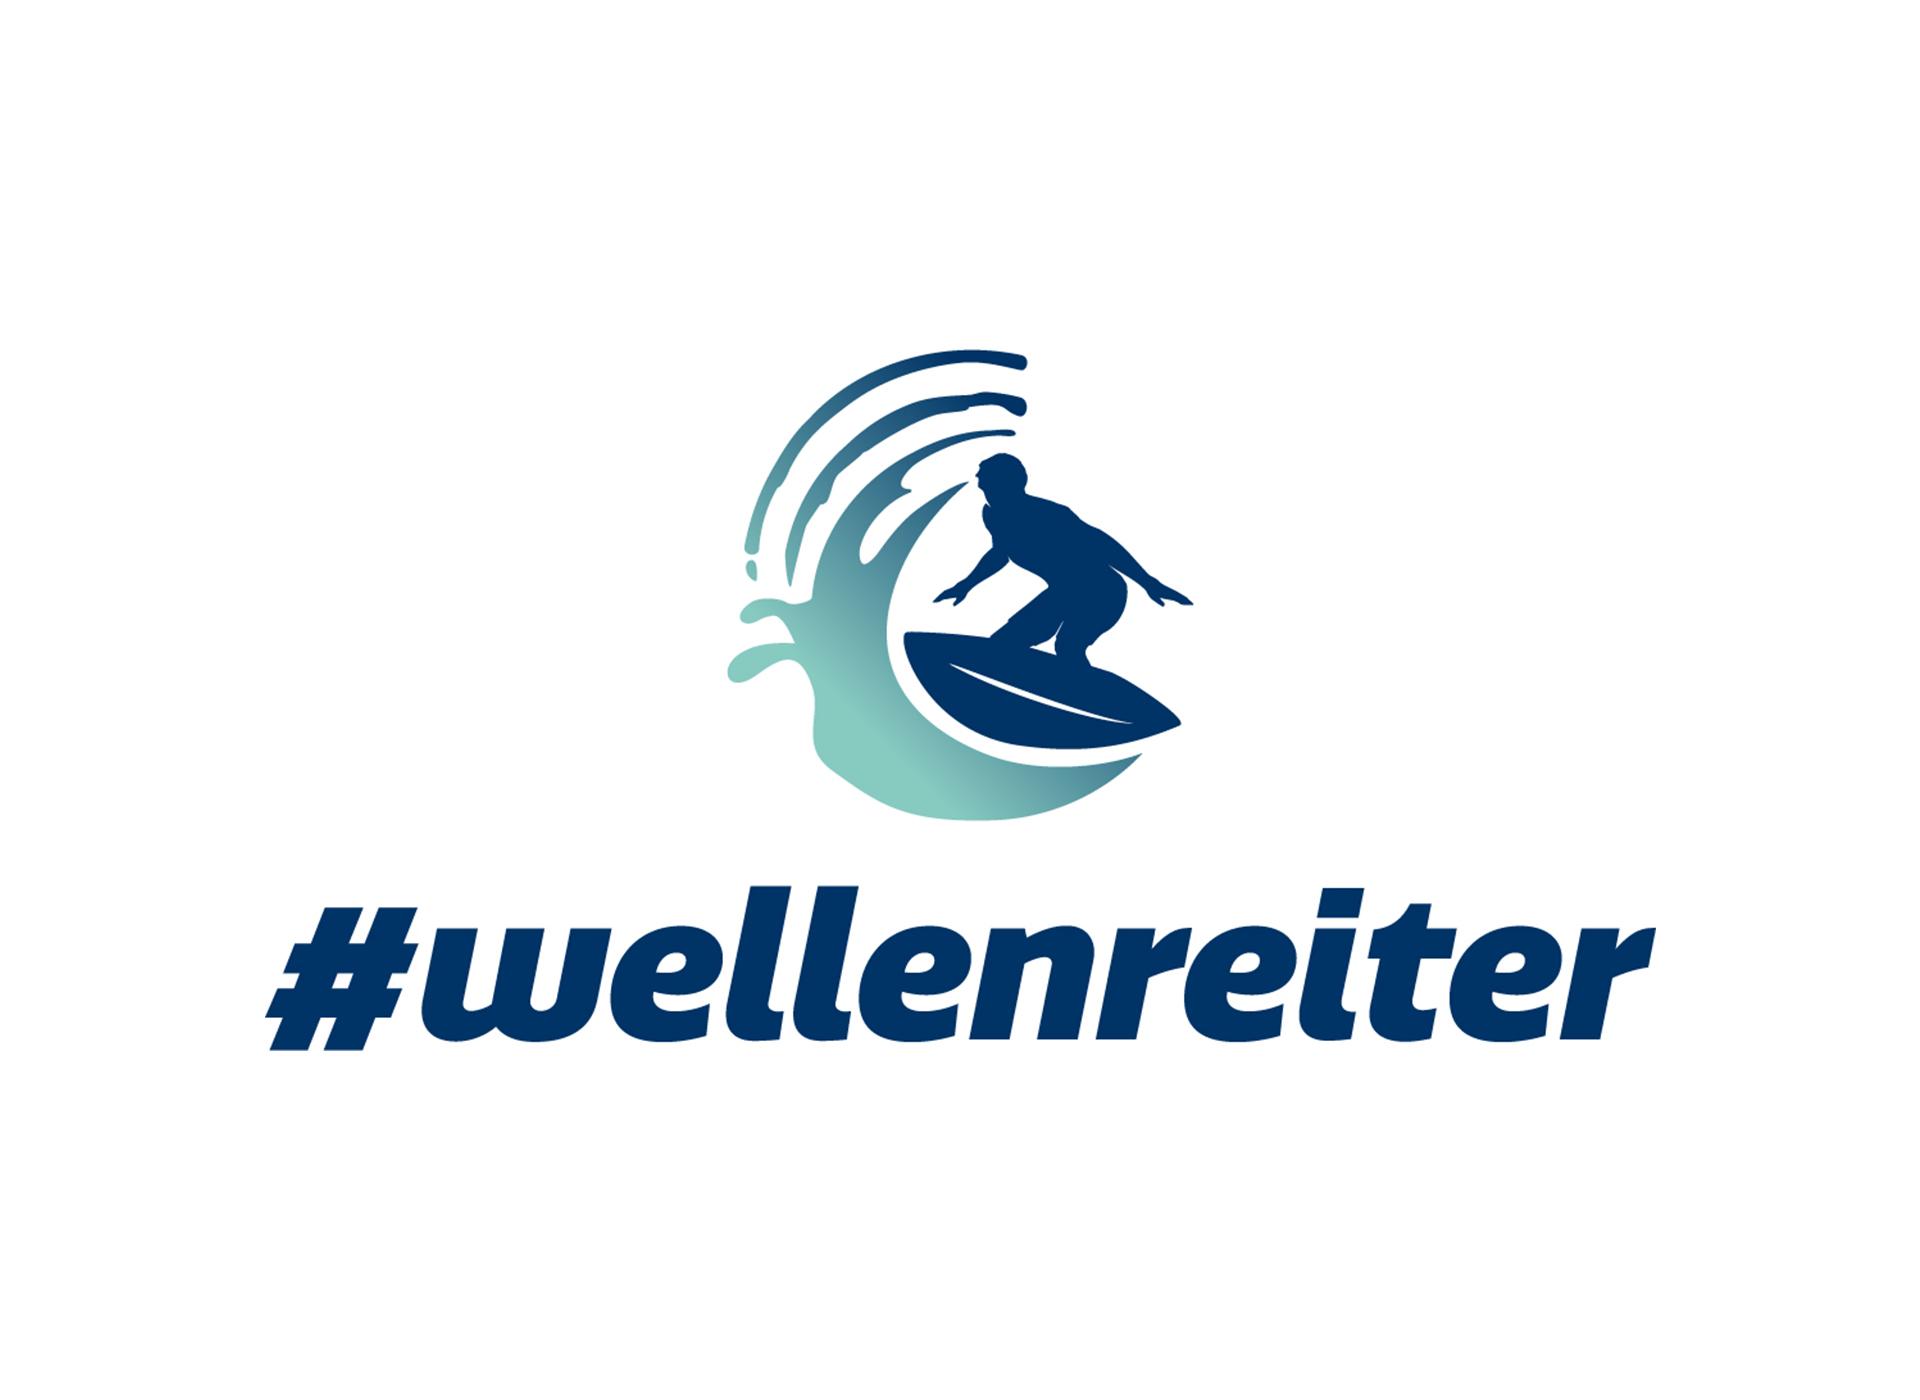 20 years of innosent - we are #wellenreiter